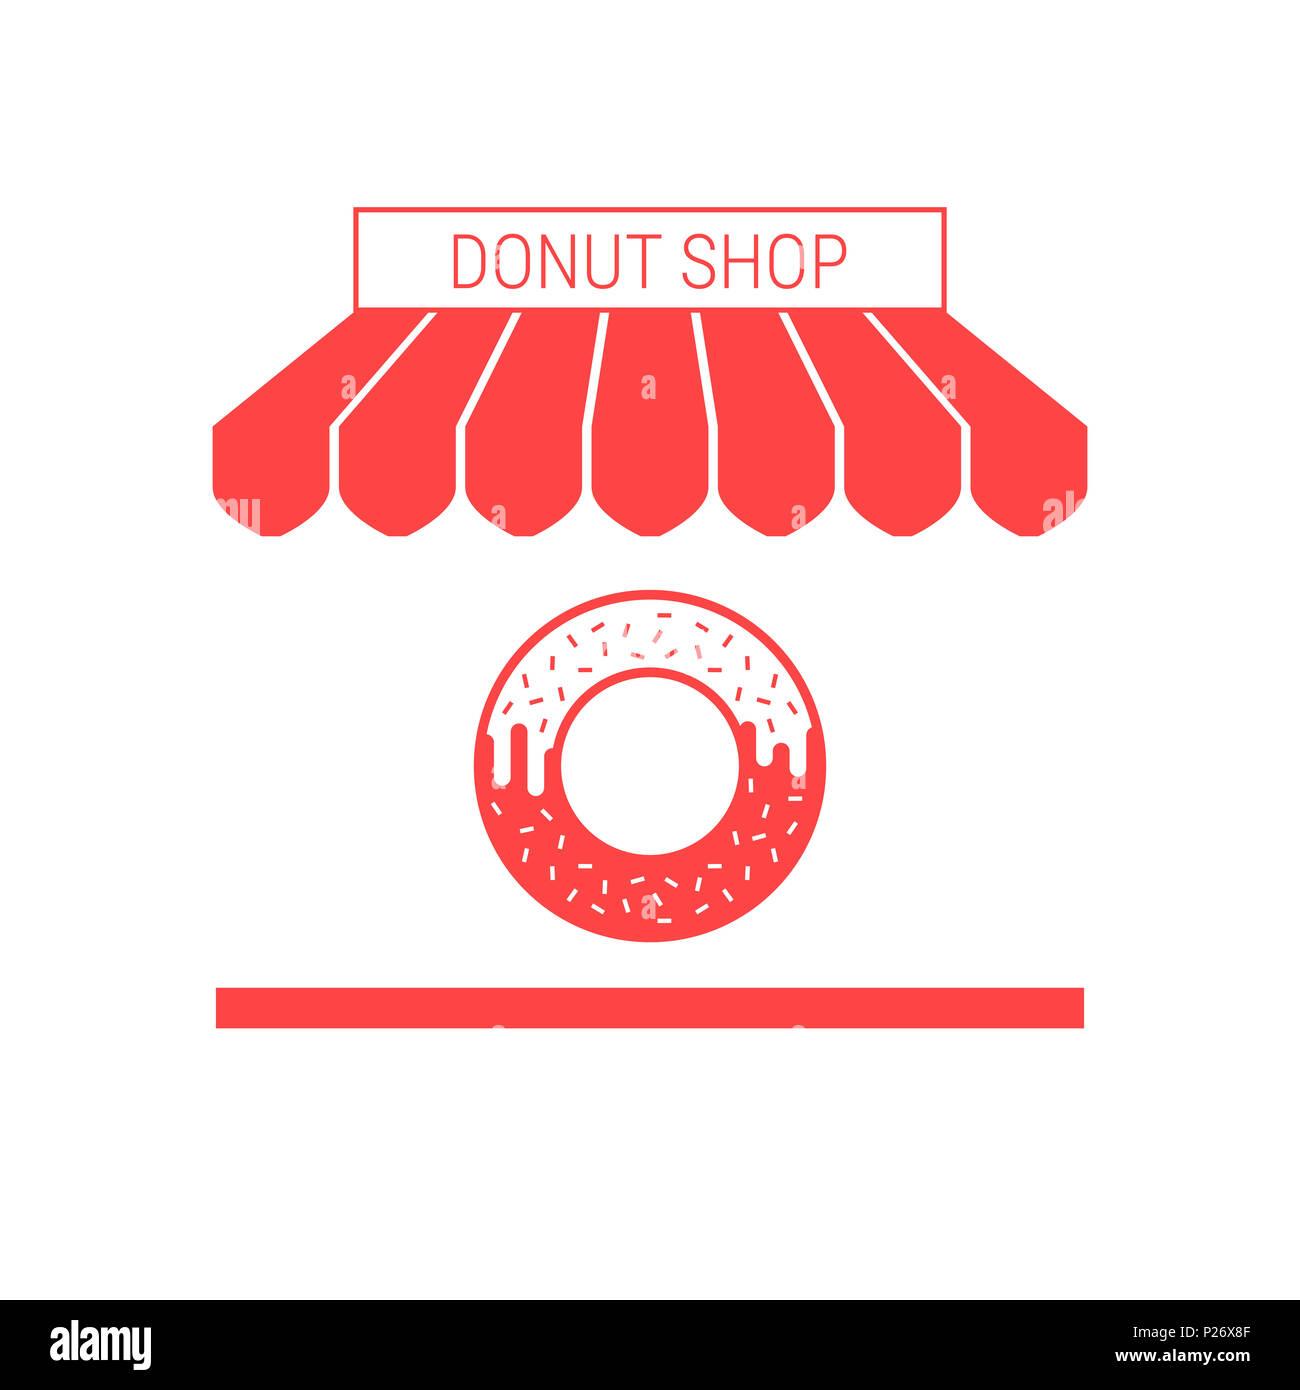 Donut Shop Stock Photos Amp Donut Shop Stock Images Alamy